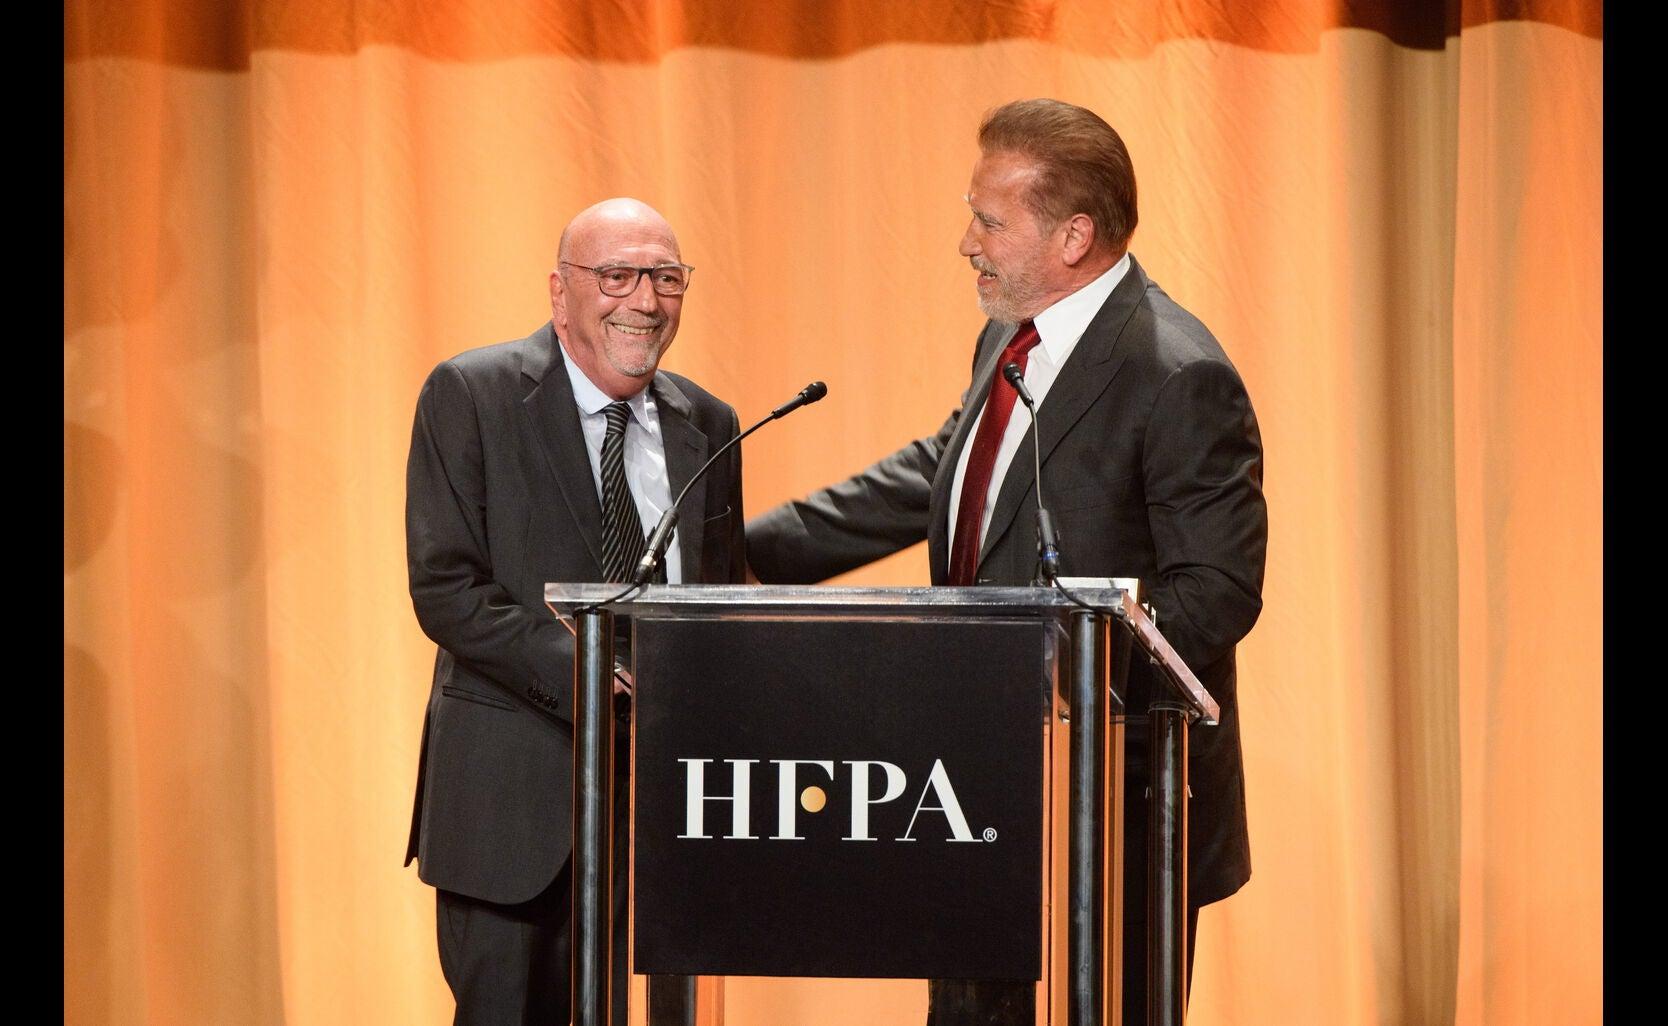 HFPA president Lorenzo Soria and actor Arnold Schwarzenegger, Golden Globe winner